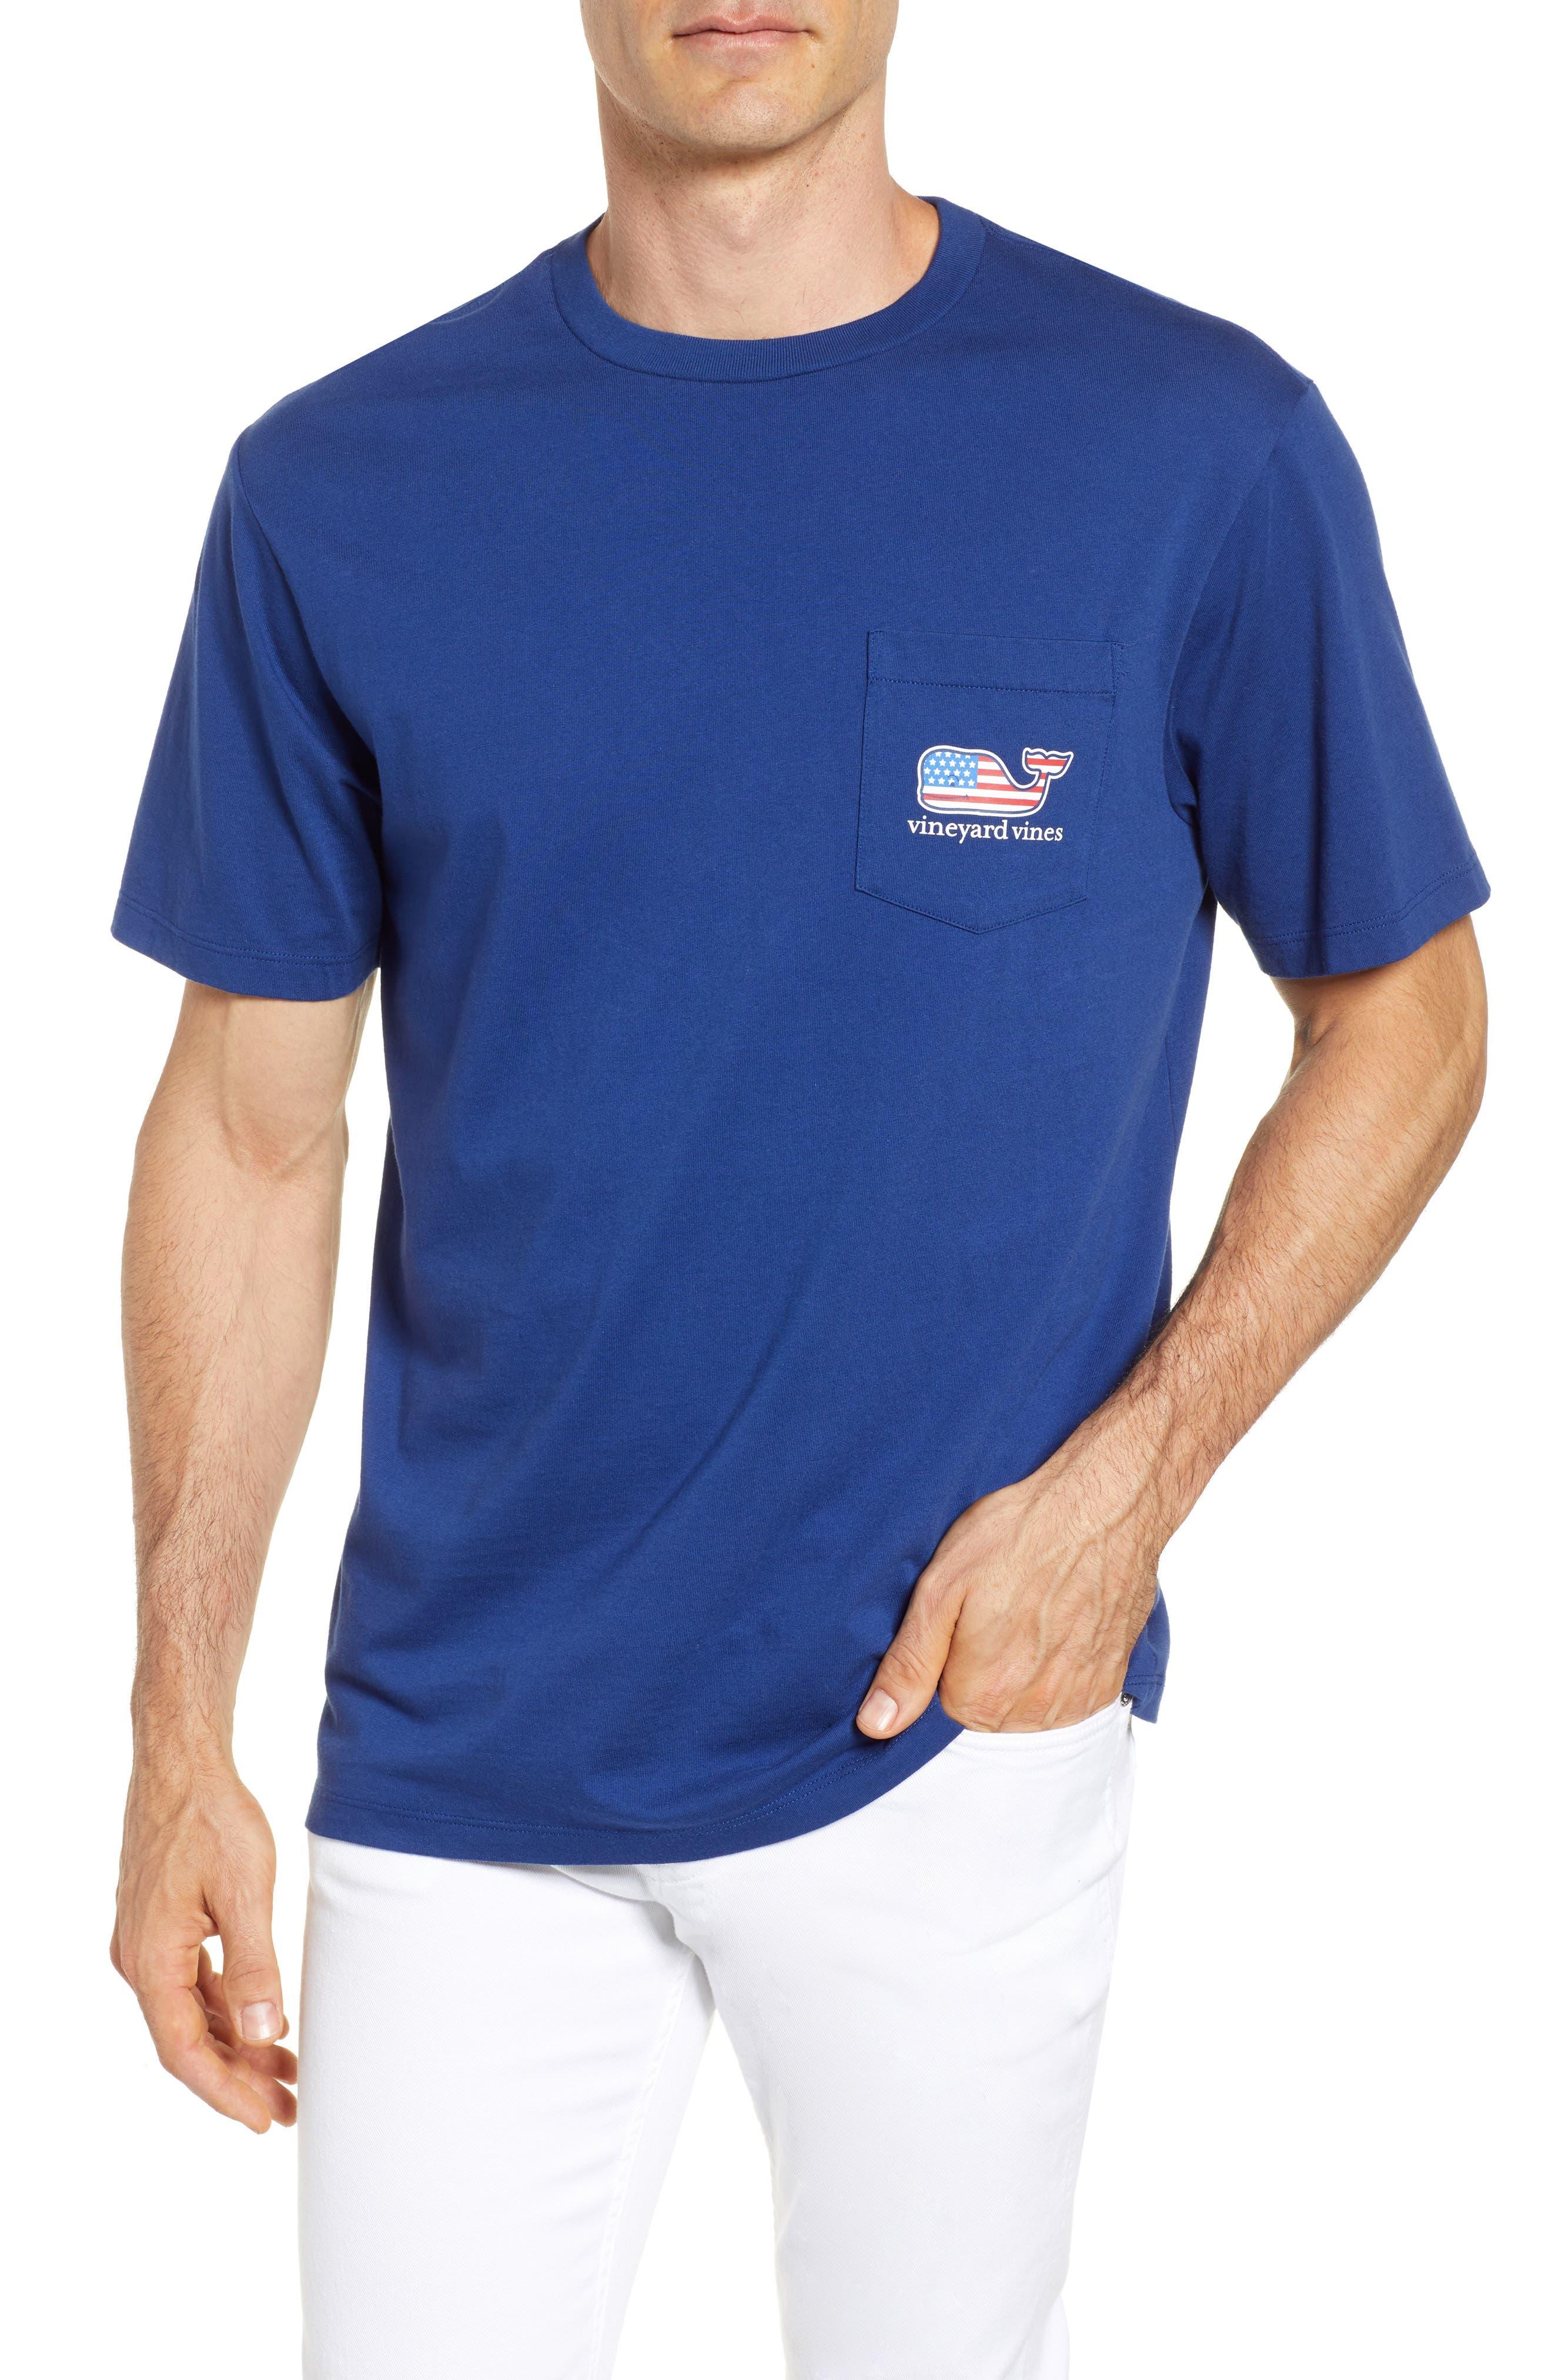 U.S. Tradition Pocket T-Shirt,                         Main,                         color, Blue Depth